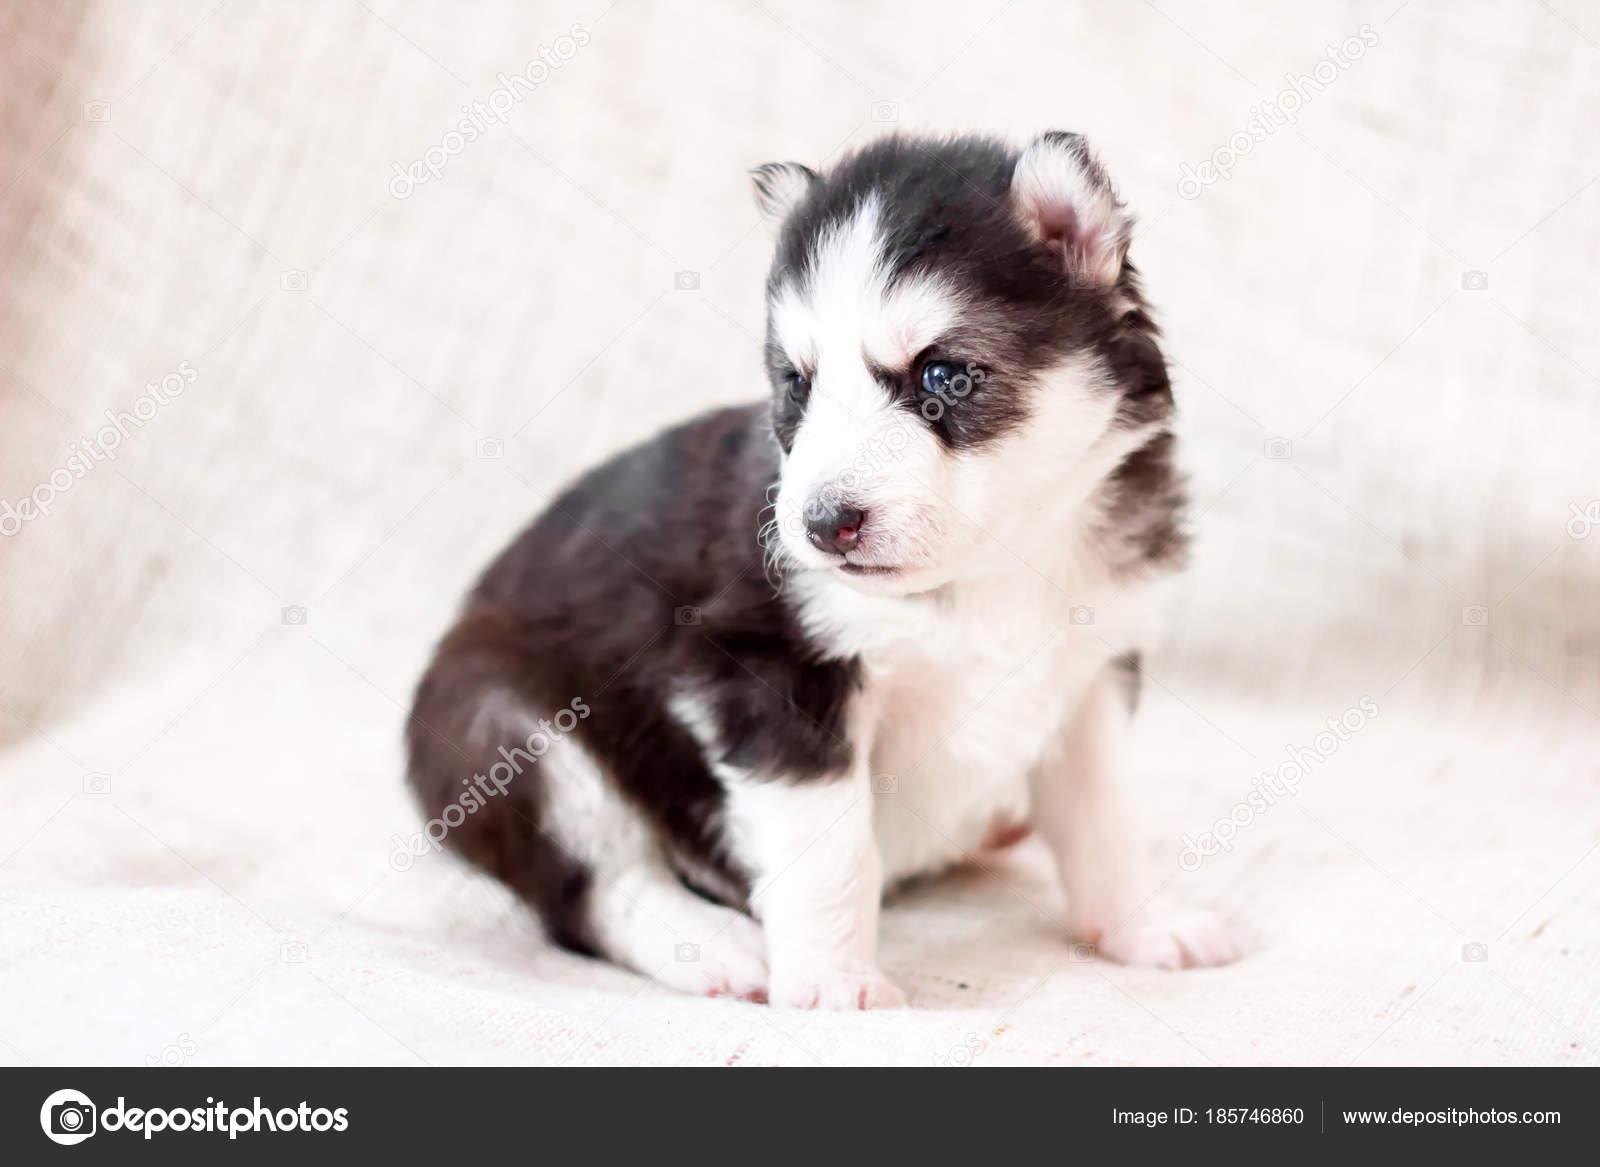 Cute Siberian Husky Puppy Sitting On Sofa At Home Stock Photo C Nesteaav 185746860